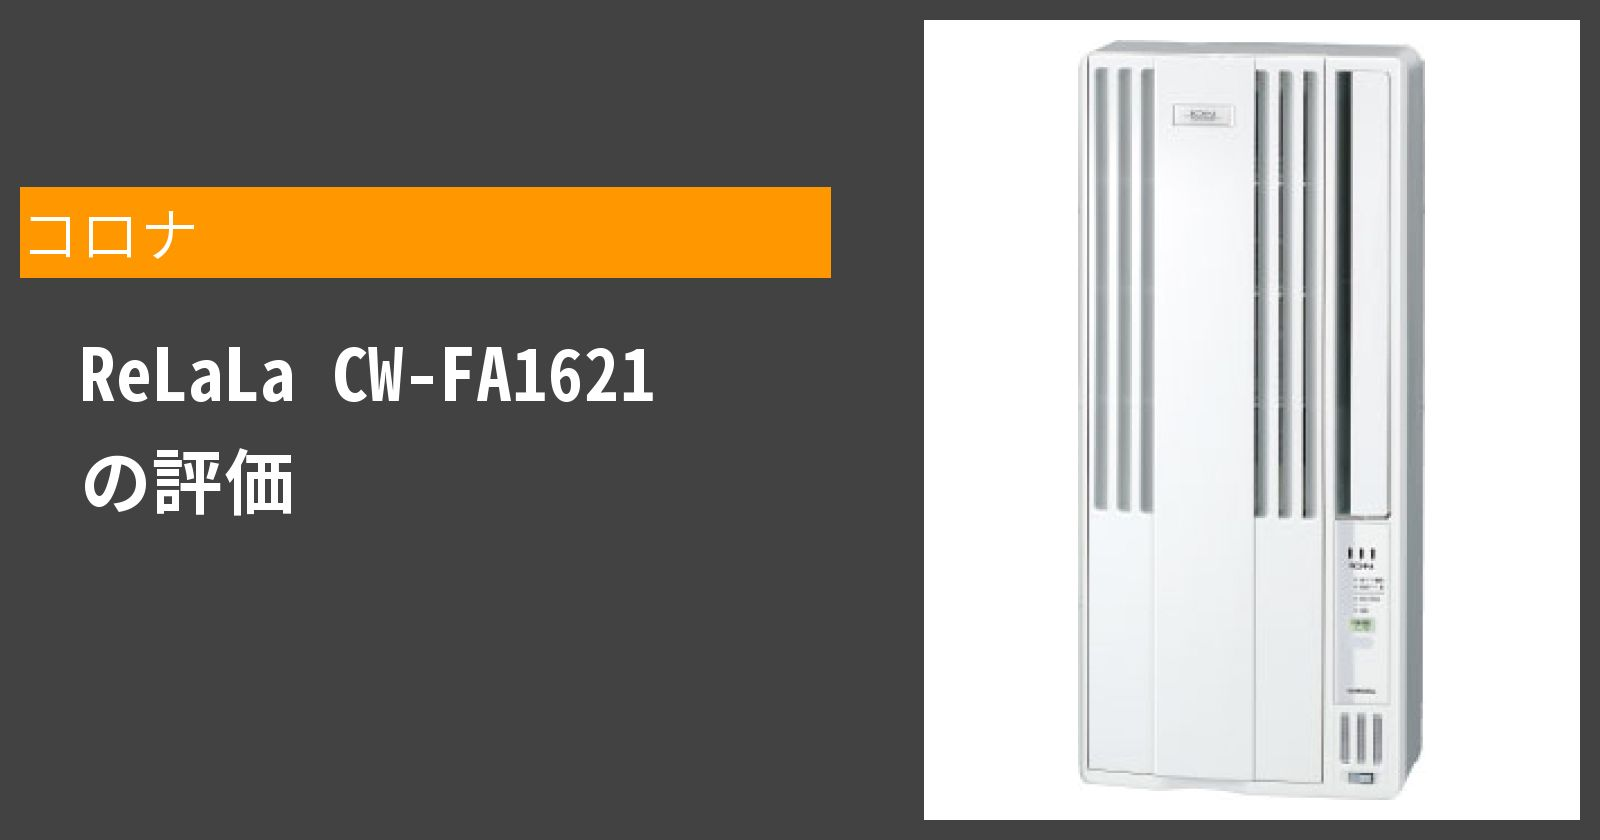 ReLaLa CW-FA1621を徹底評価